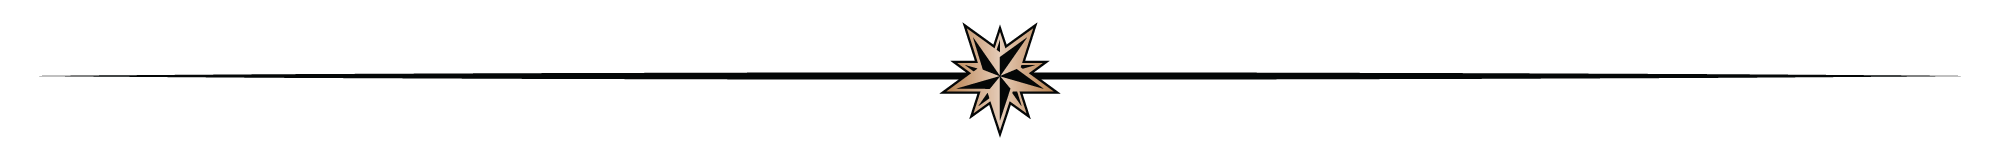 Star_Divider.png